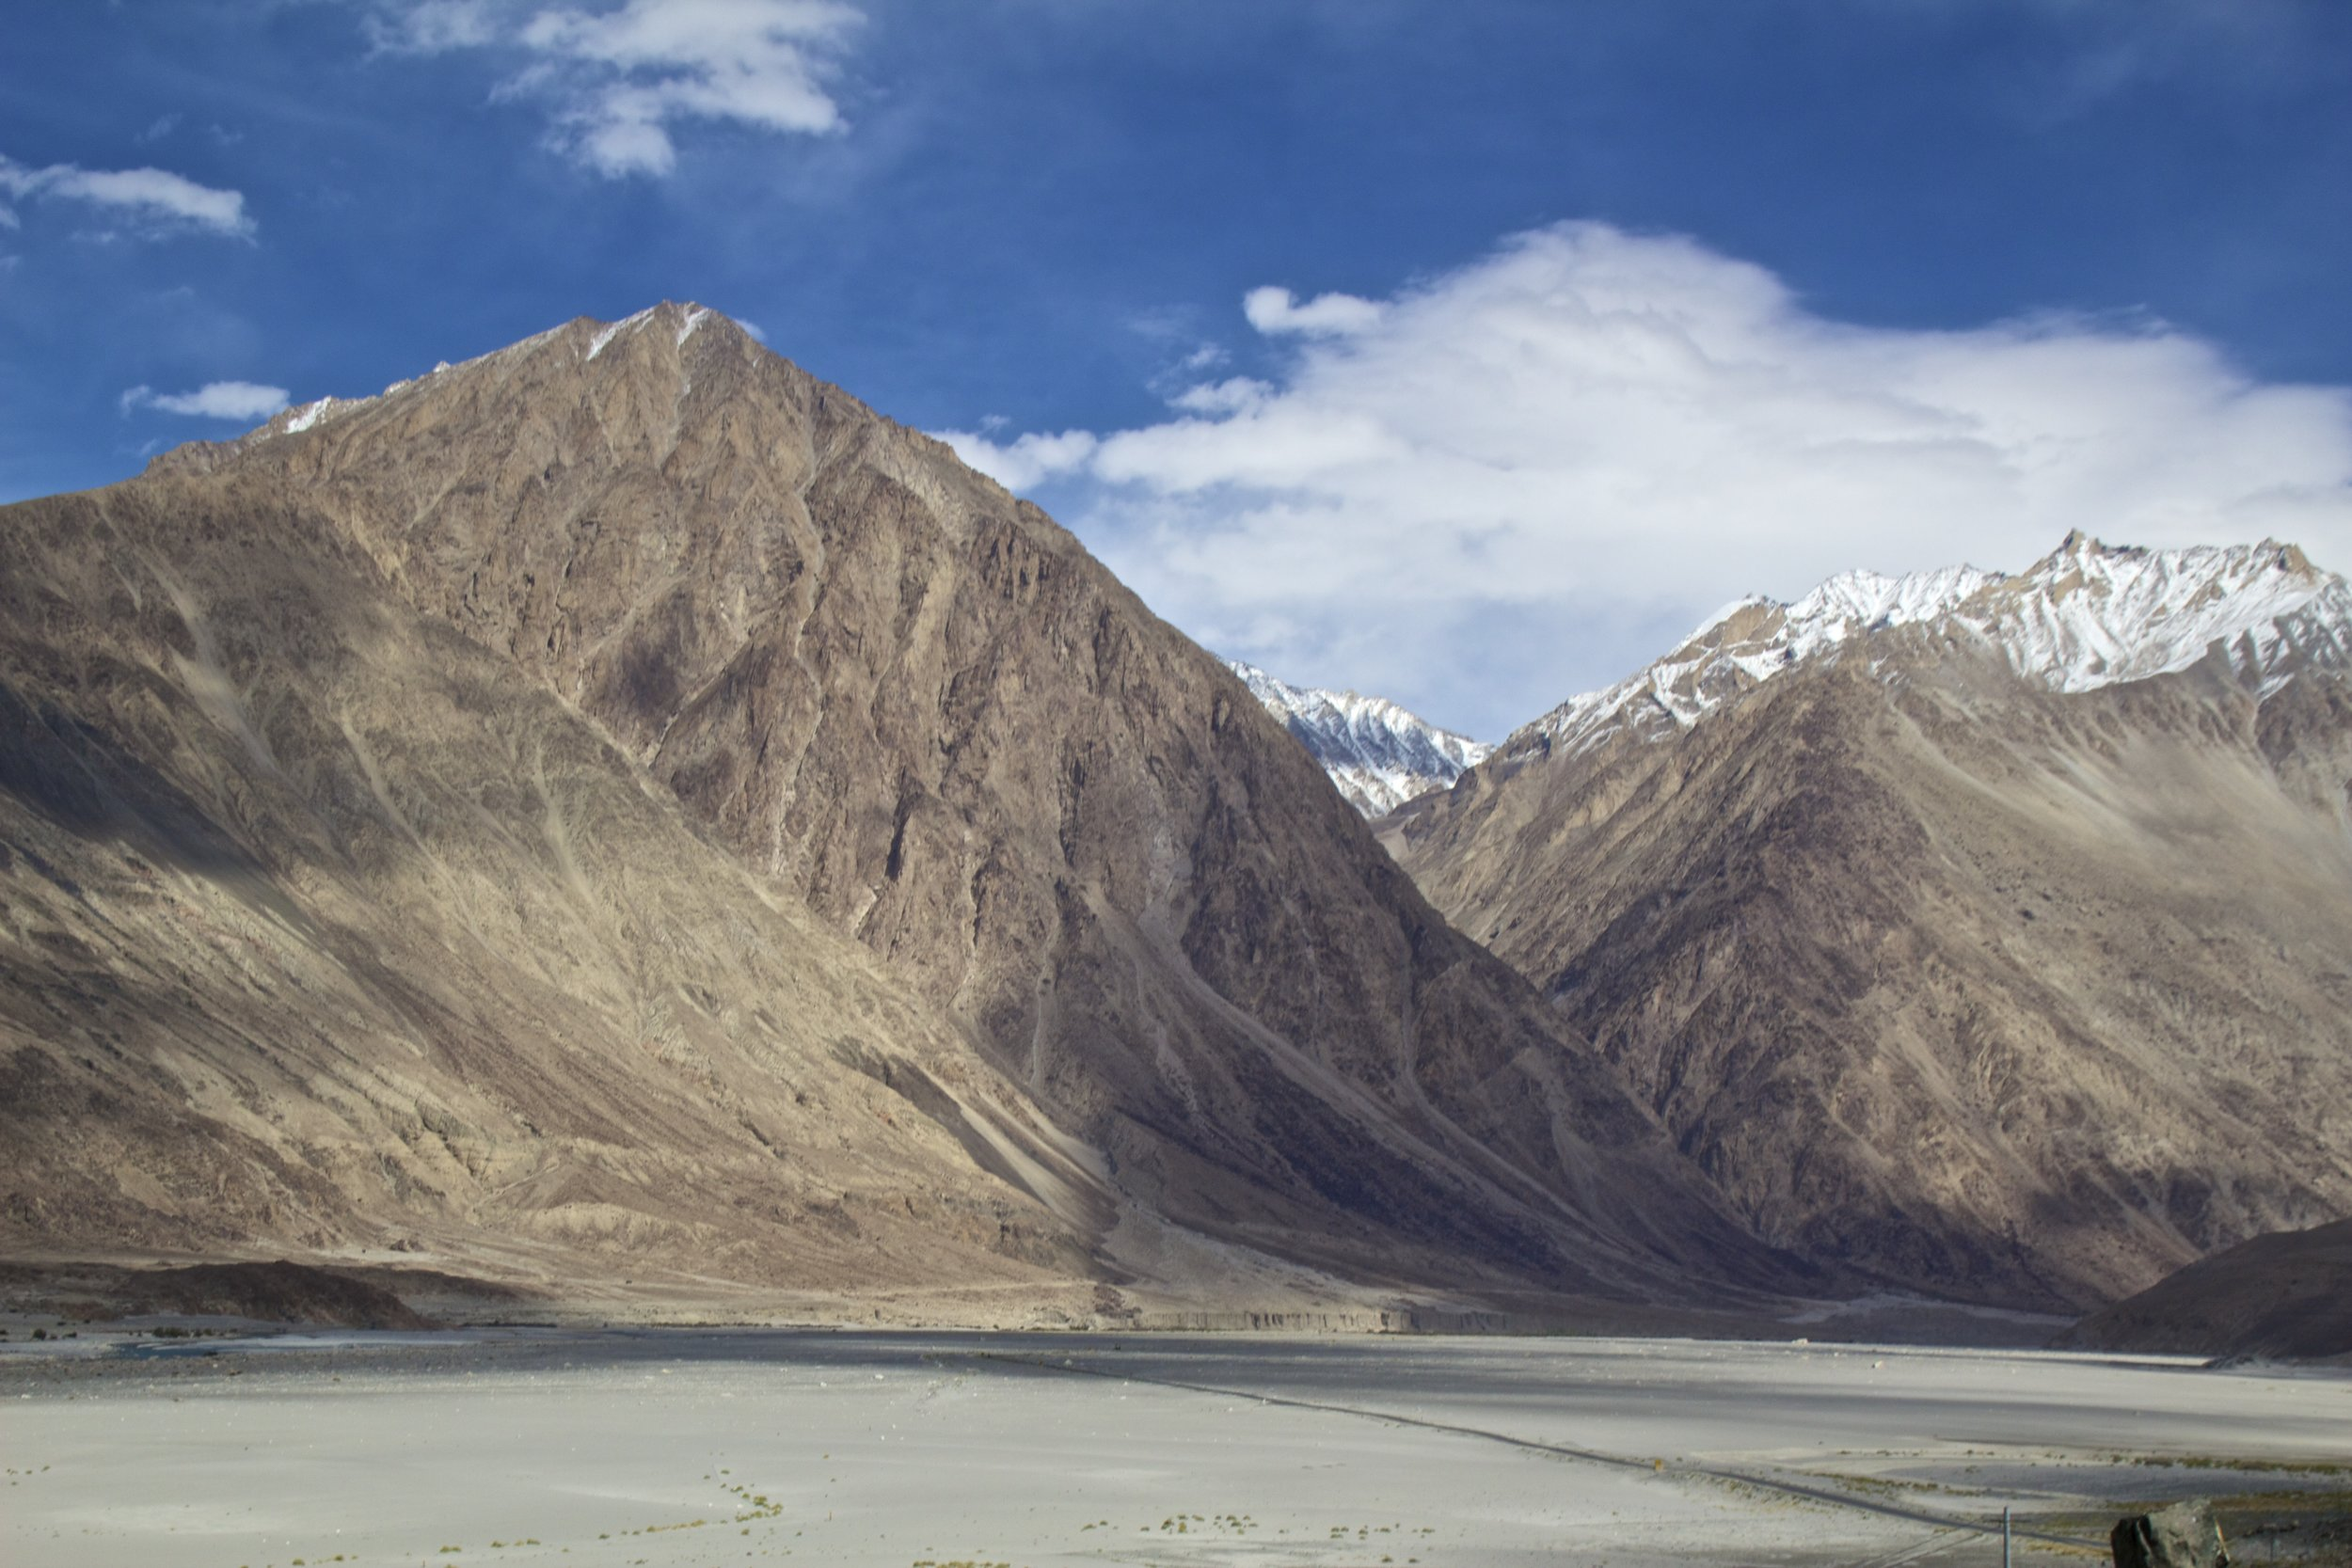 Nubra Valley Ladakh Kashmir Indian Himalayas Desert Dunes 3.jpg